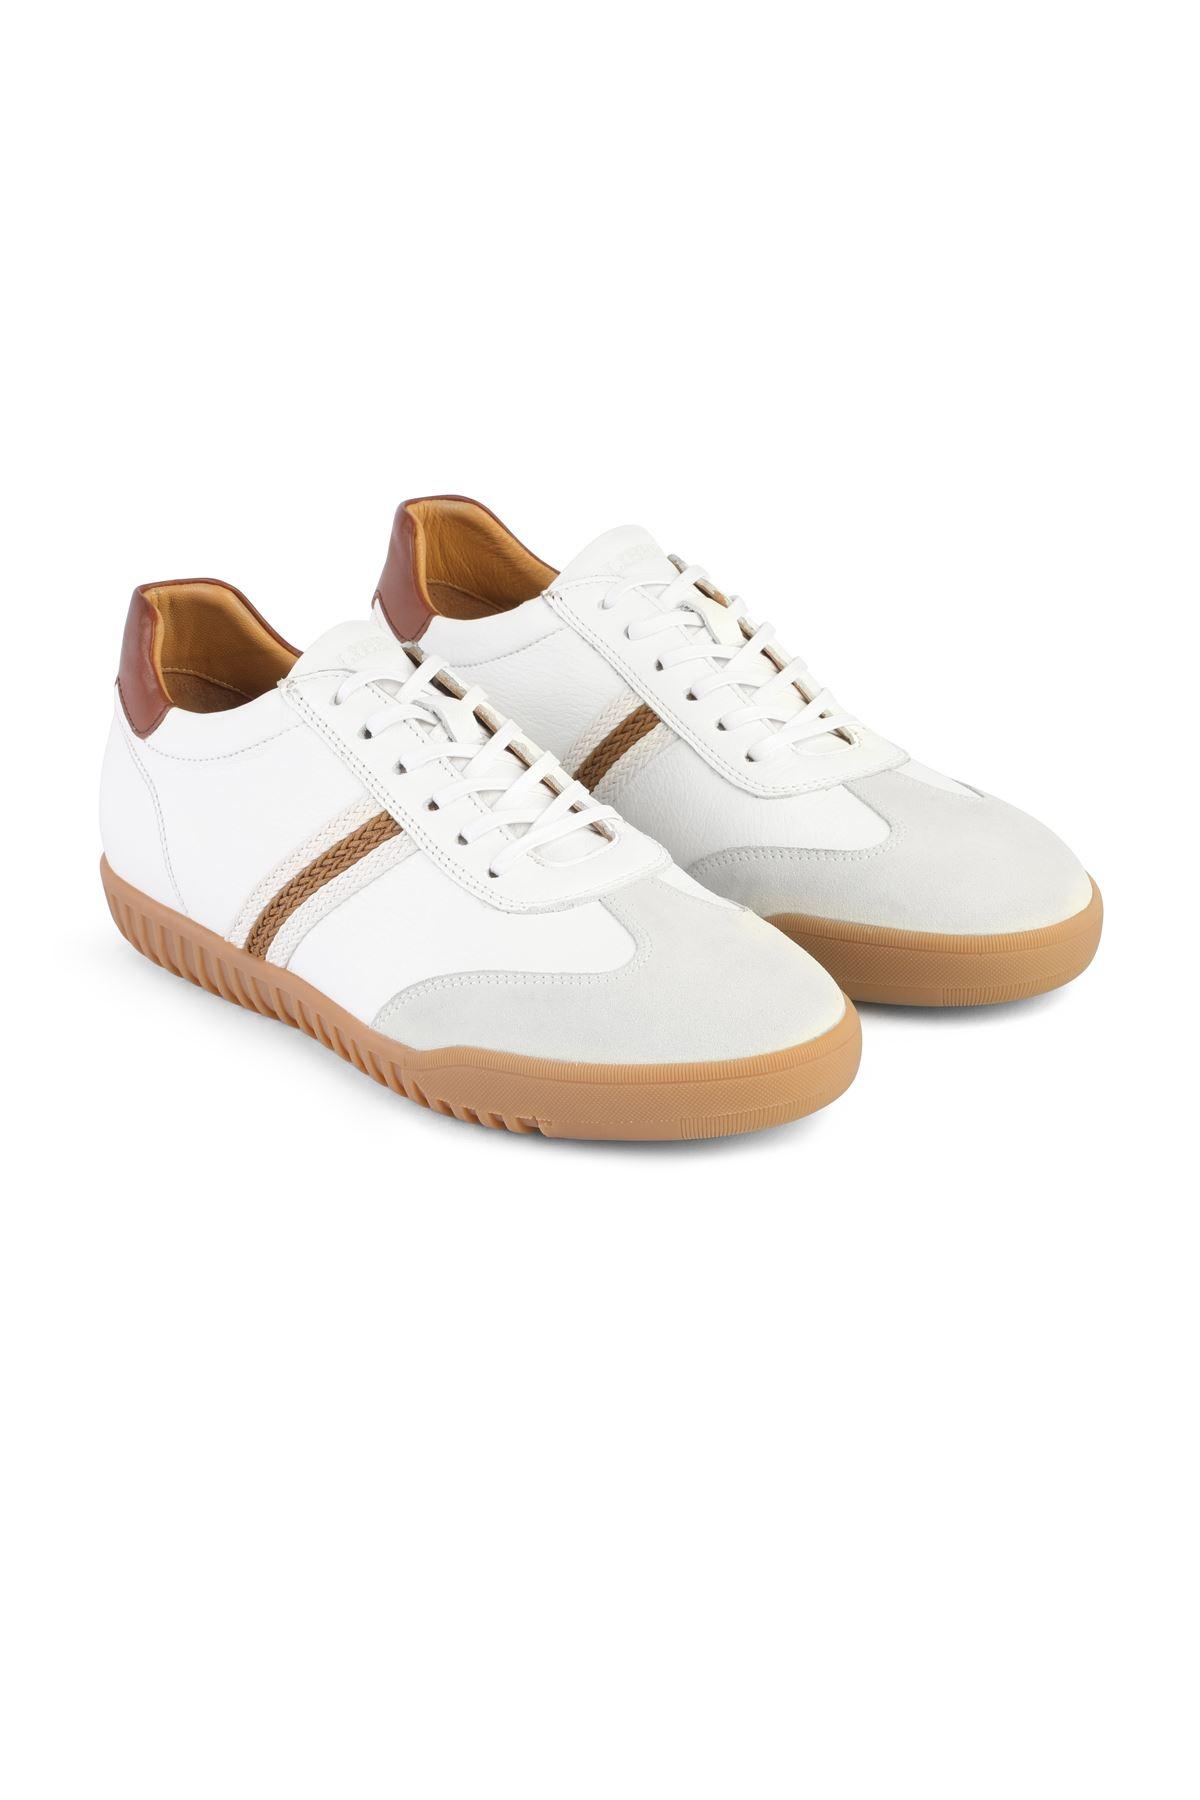 Libero 3422 White Sneakers